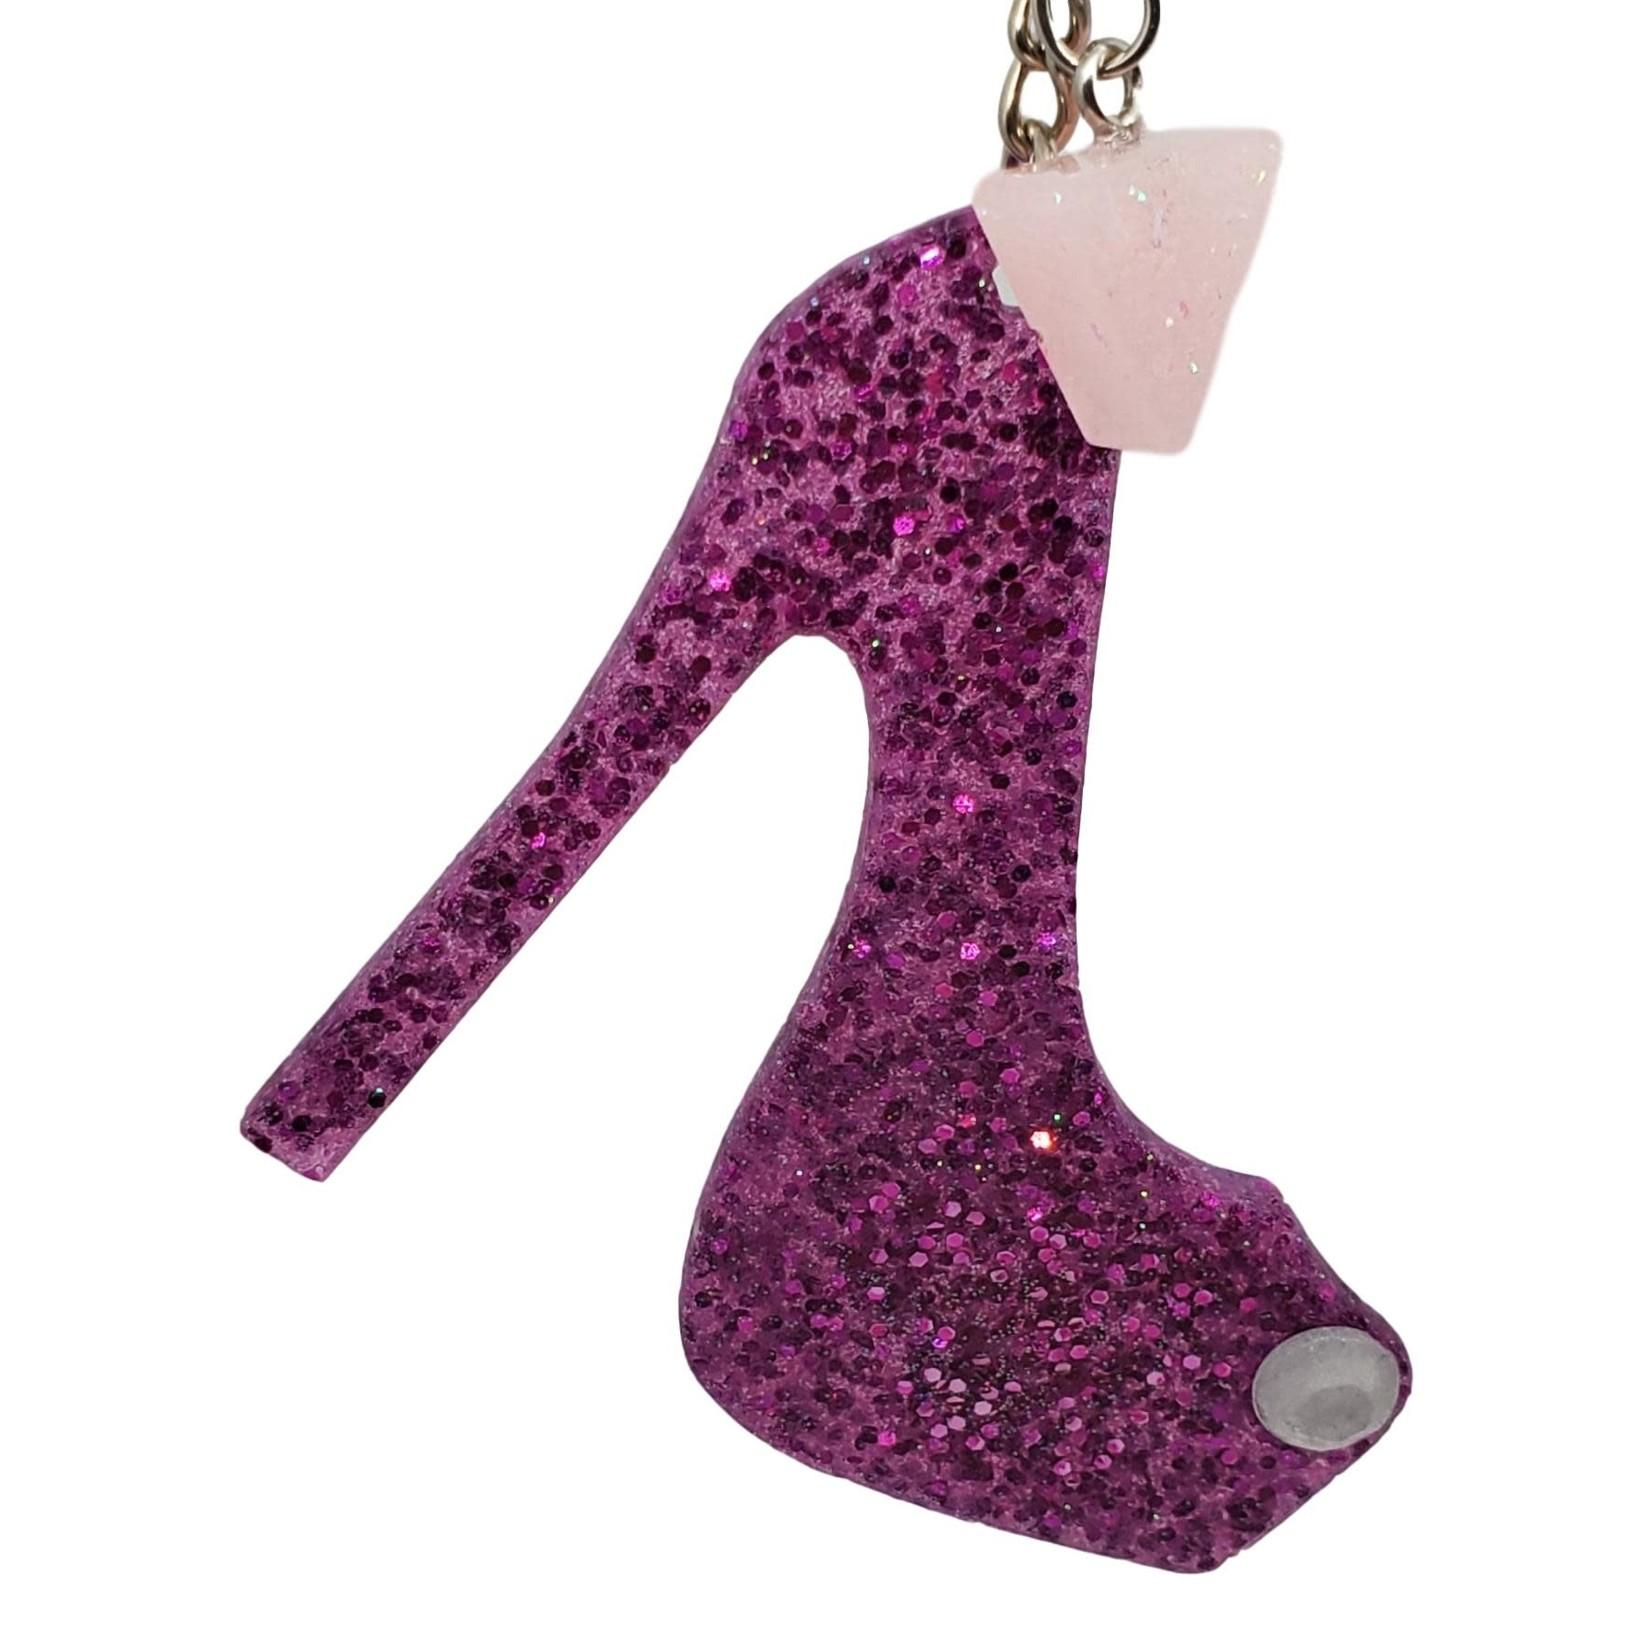 East Coast Sirens Pink Glitter High-heel Pump Key Chain